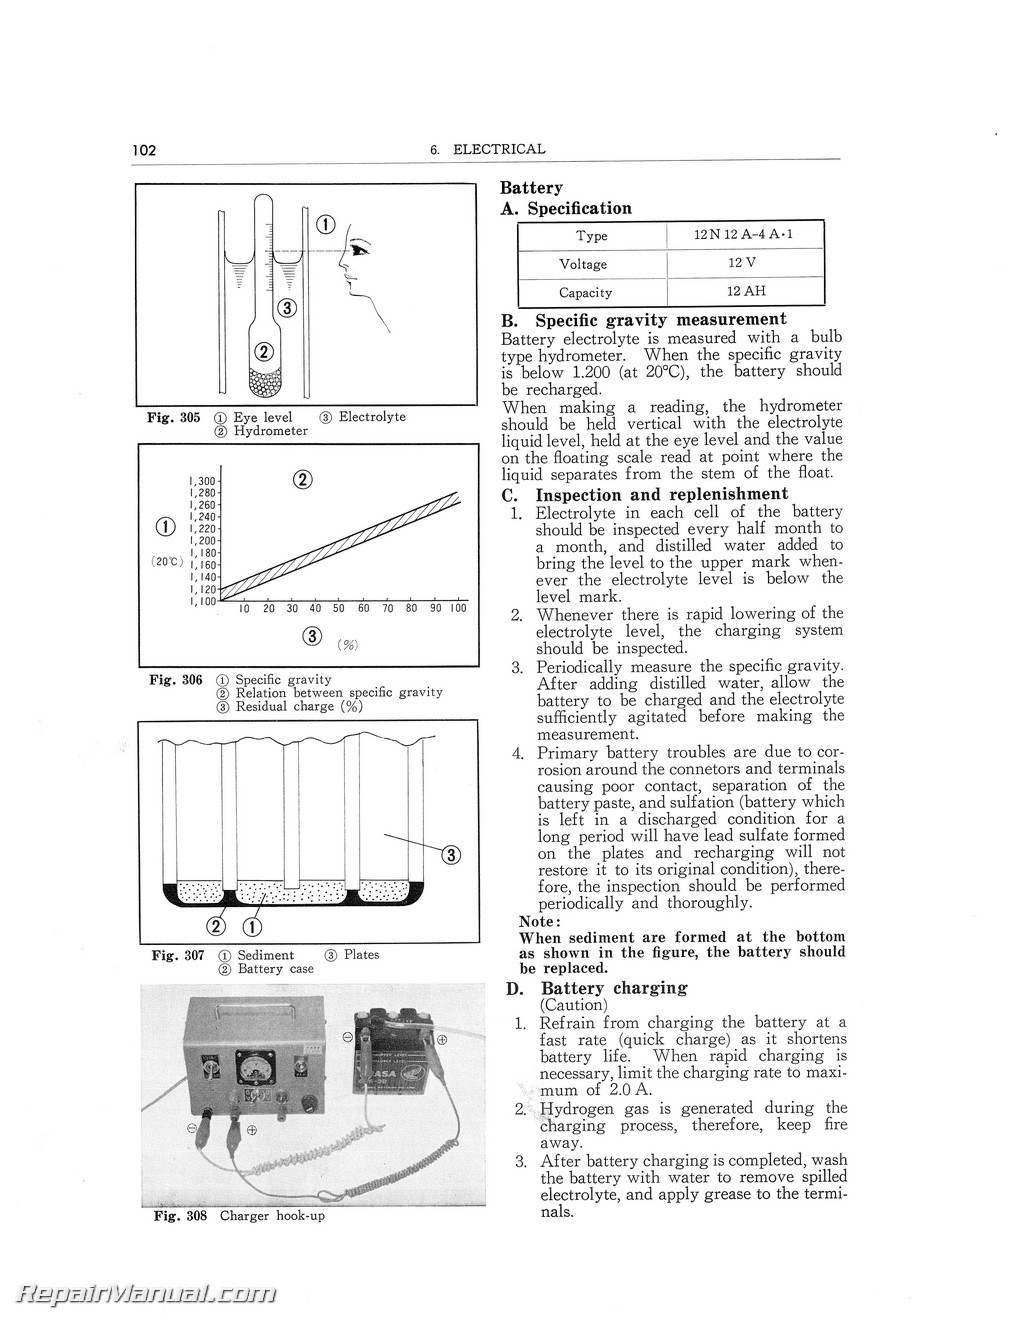 1972 cb750 wiring diagram motorcycle alarm 1974 honda cb550 service manual